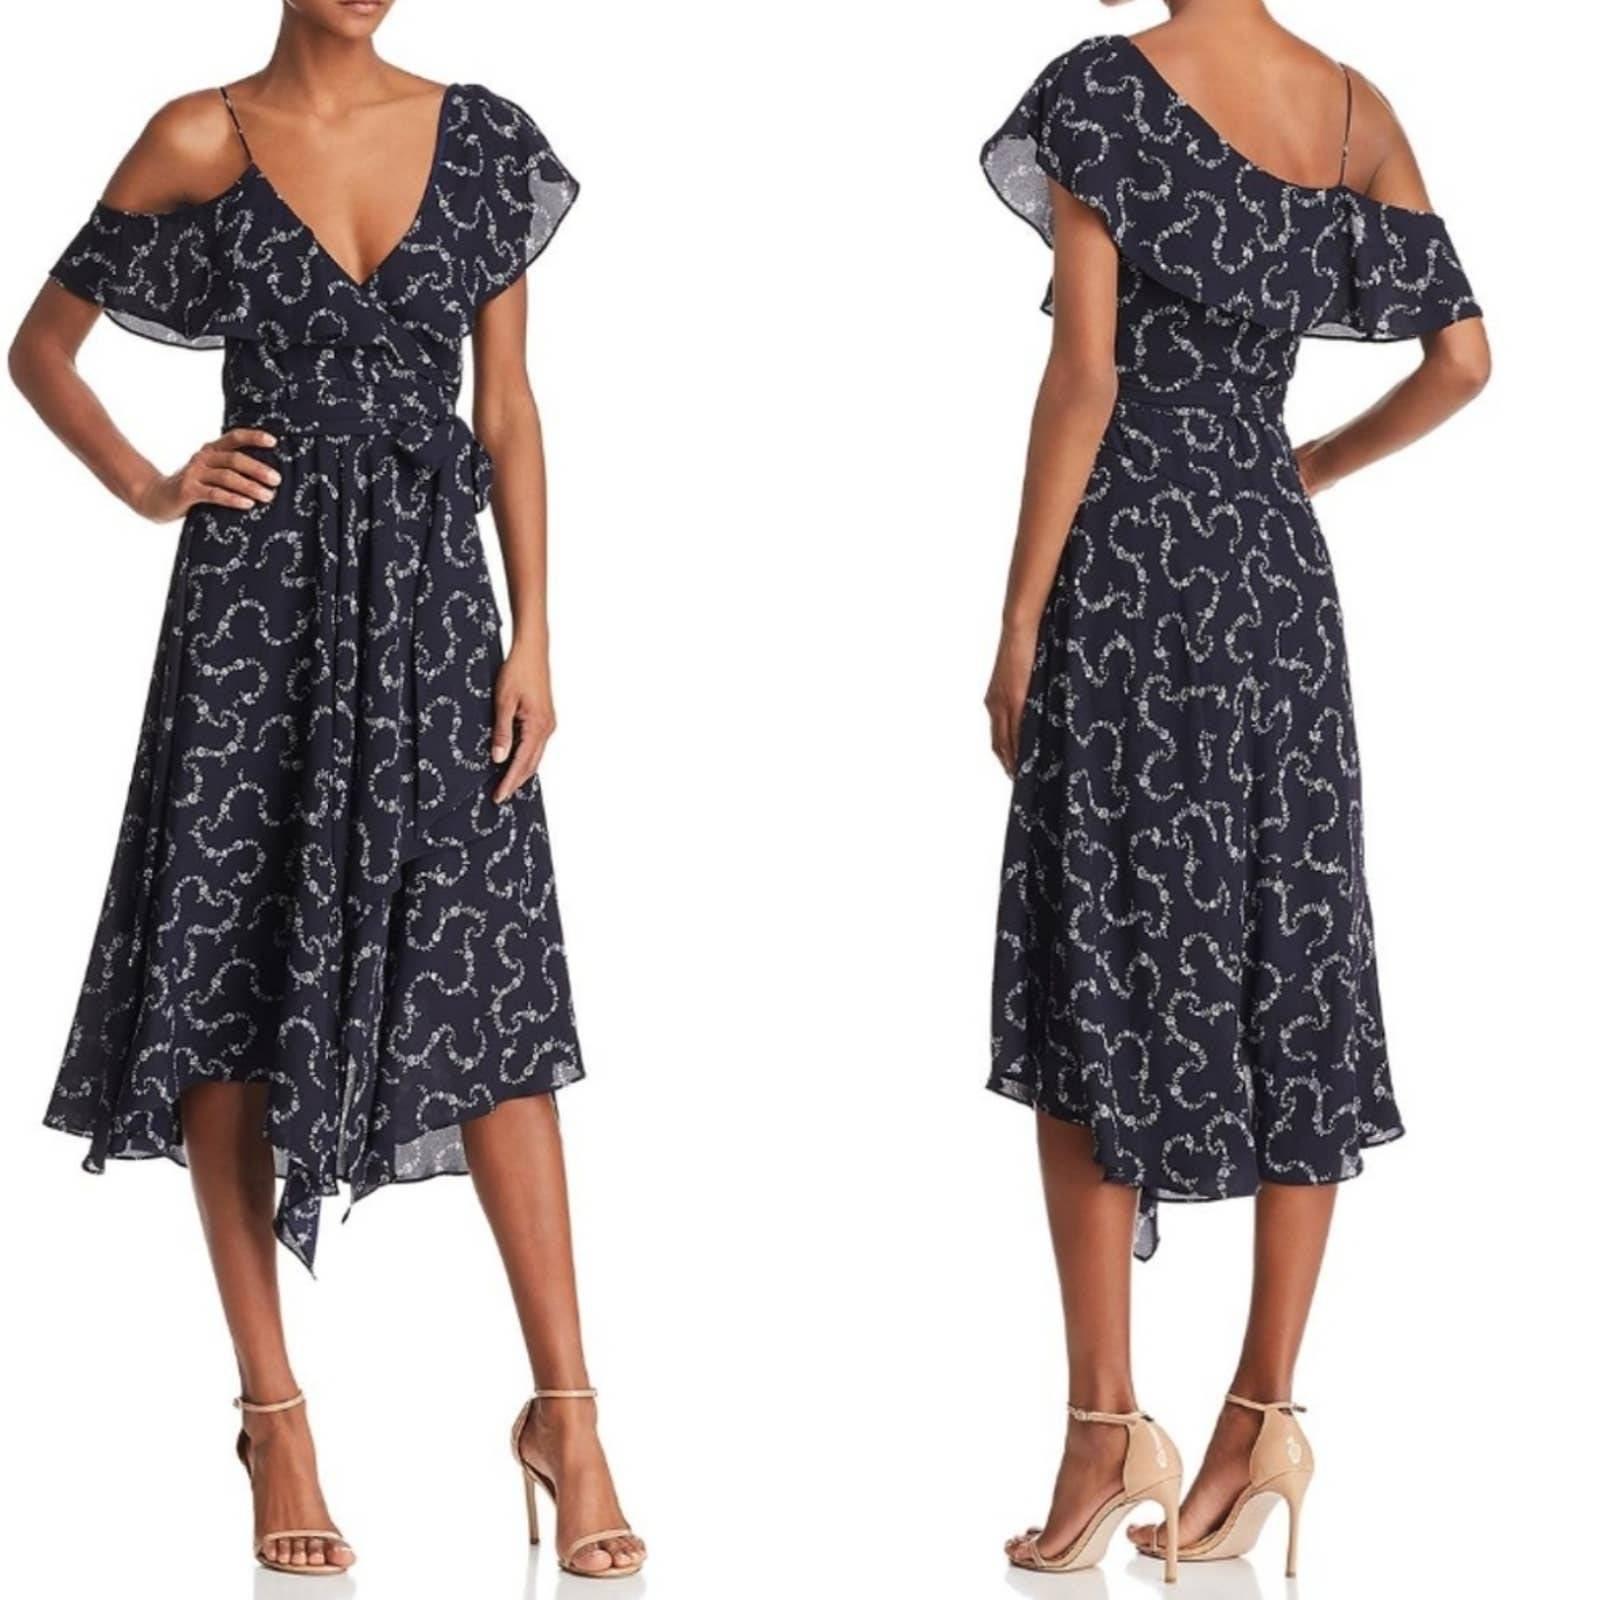 NWT Revolve Likely Leilani Wrap Dress